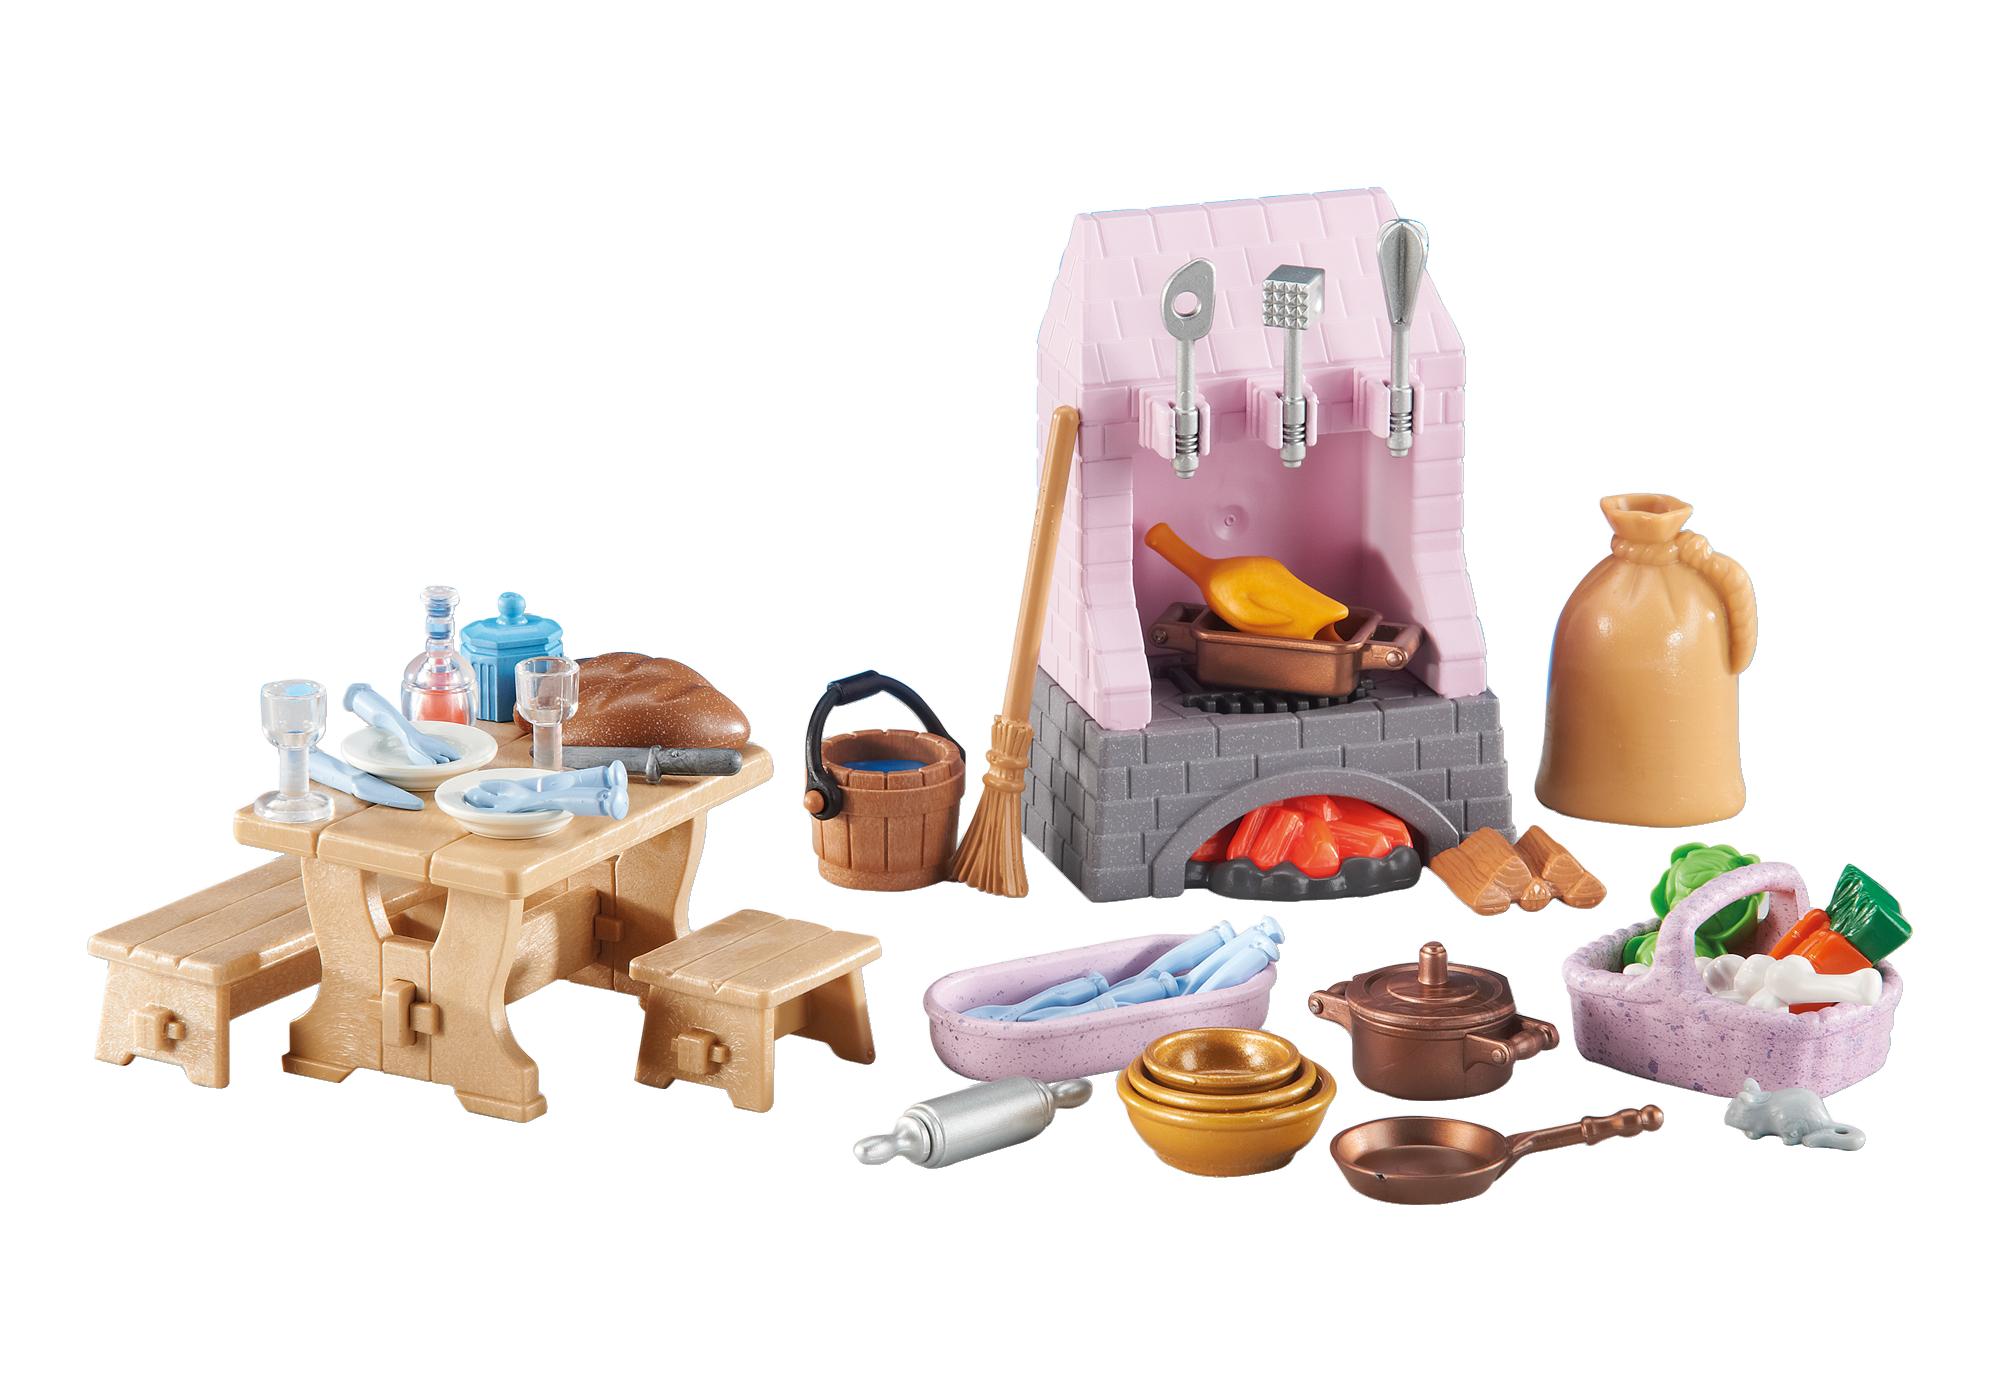 http://media.playmobil.com/i/playmobil/6521_product_detail/Cucina regale